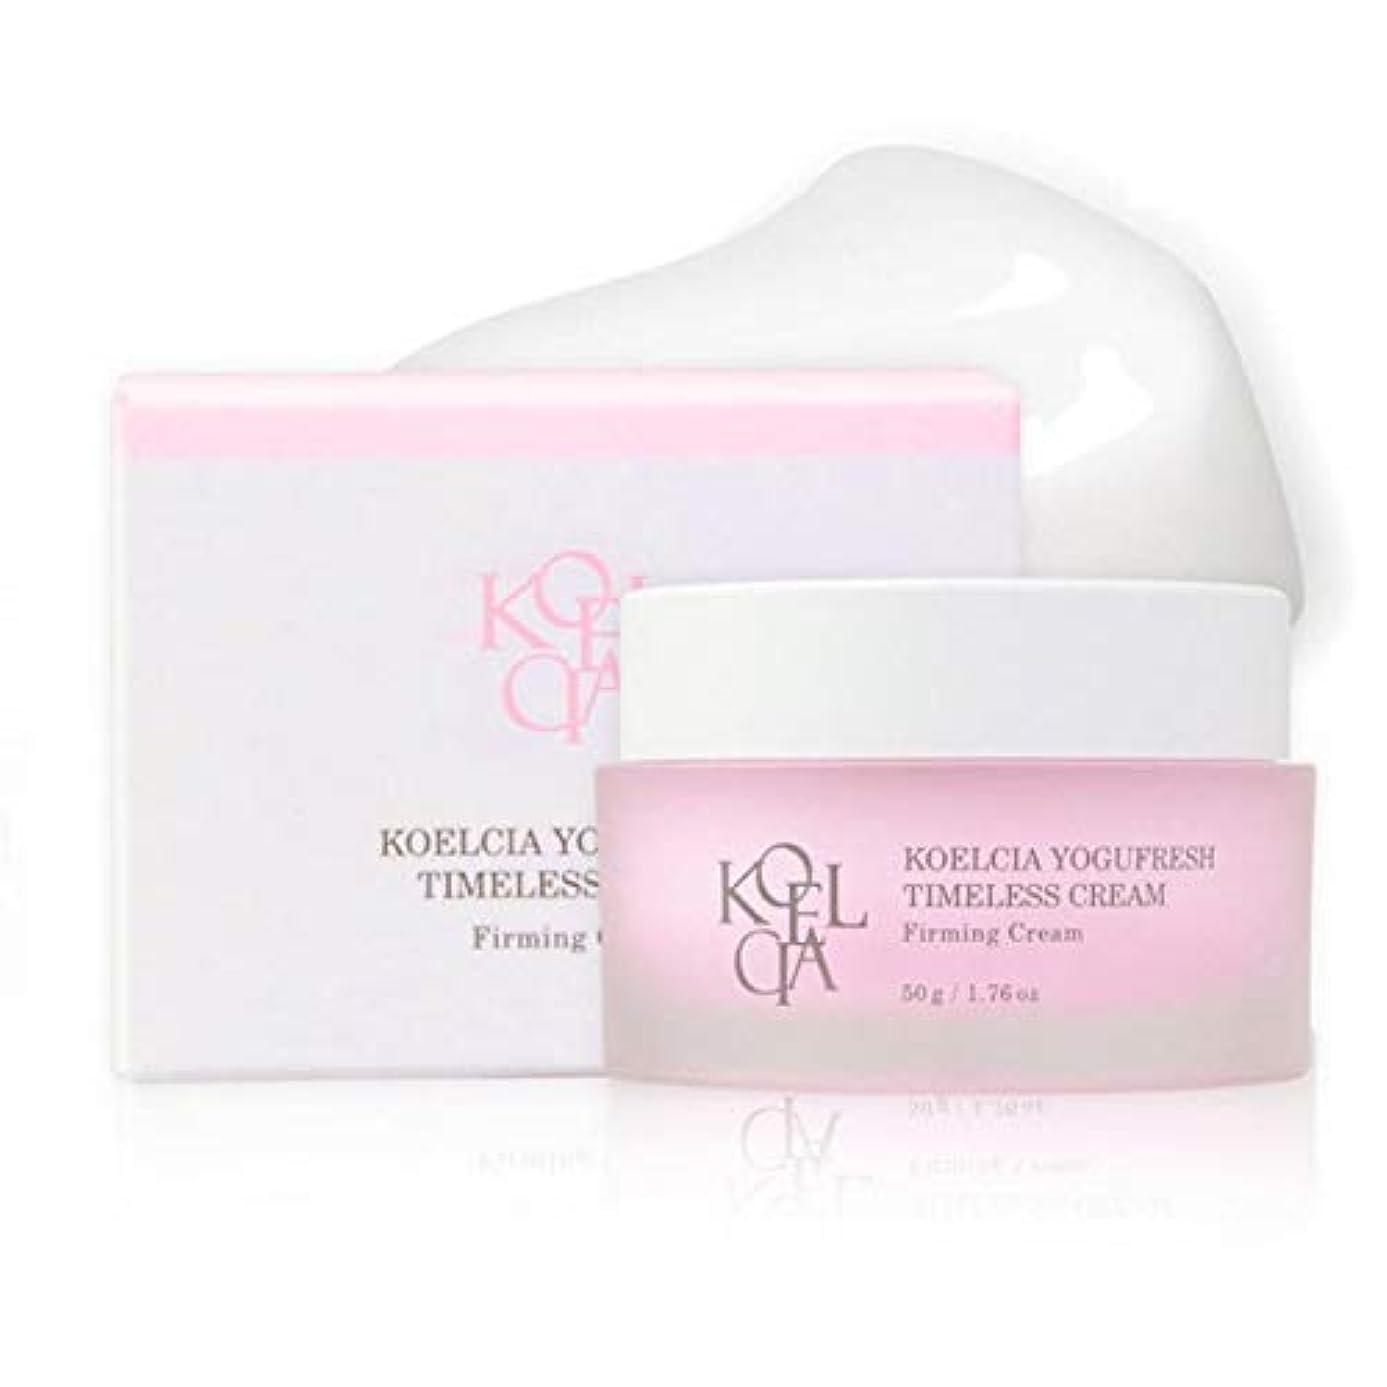 [KOELCIA] YOGUFRESH TIMELESS CREAM 50g/Most Hot K-Beauty Firming/Wrinkle Care Cream/Korea Cosmetics [並行輸入品]